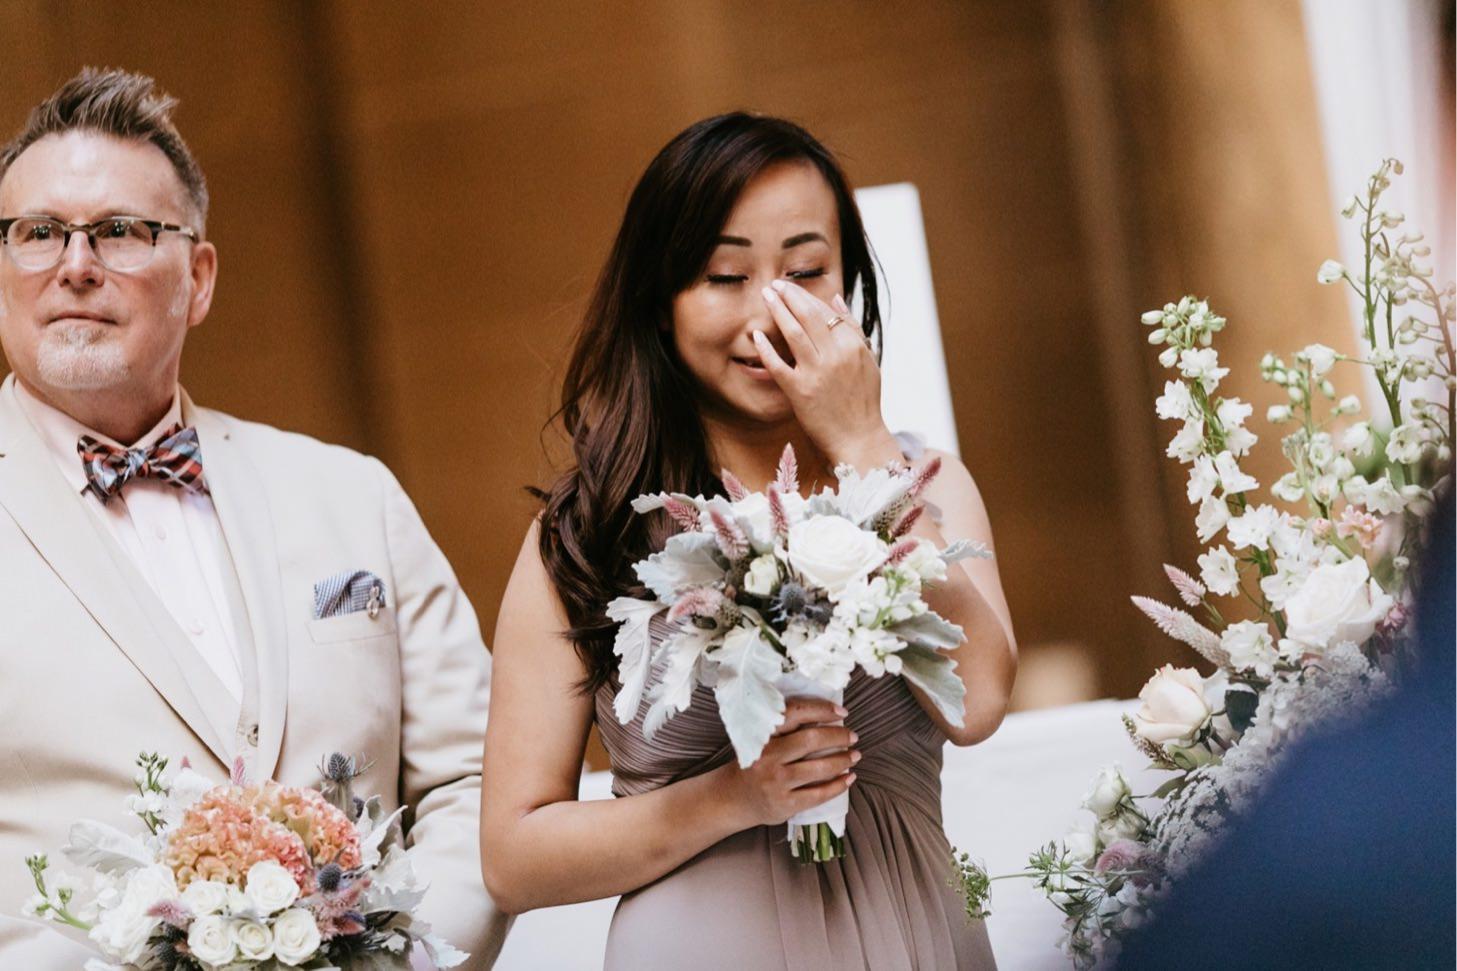 indiana-state-house-wedding-downtown-indianapolis-wedding-photographer030.JPG